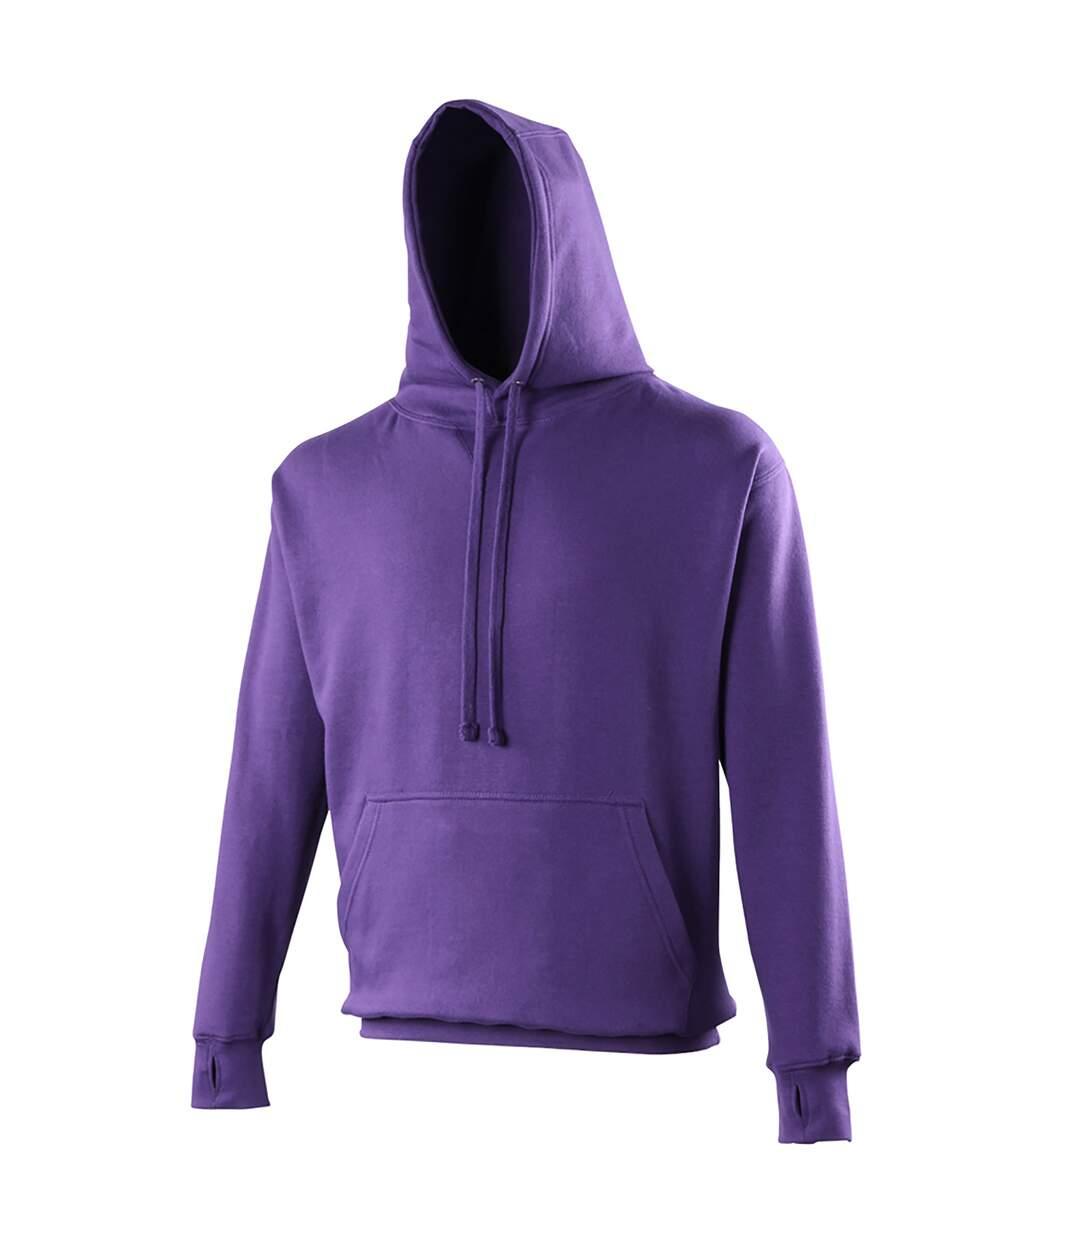 Awdis Mens Street Hooded Sweatshirt / Hoodie (Charcoal) - UTRW170